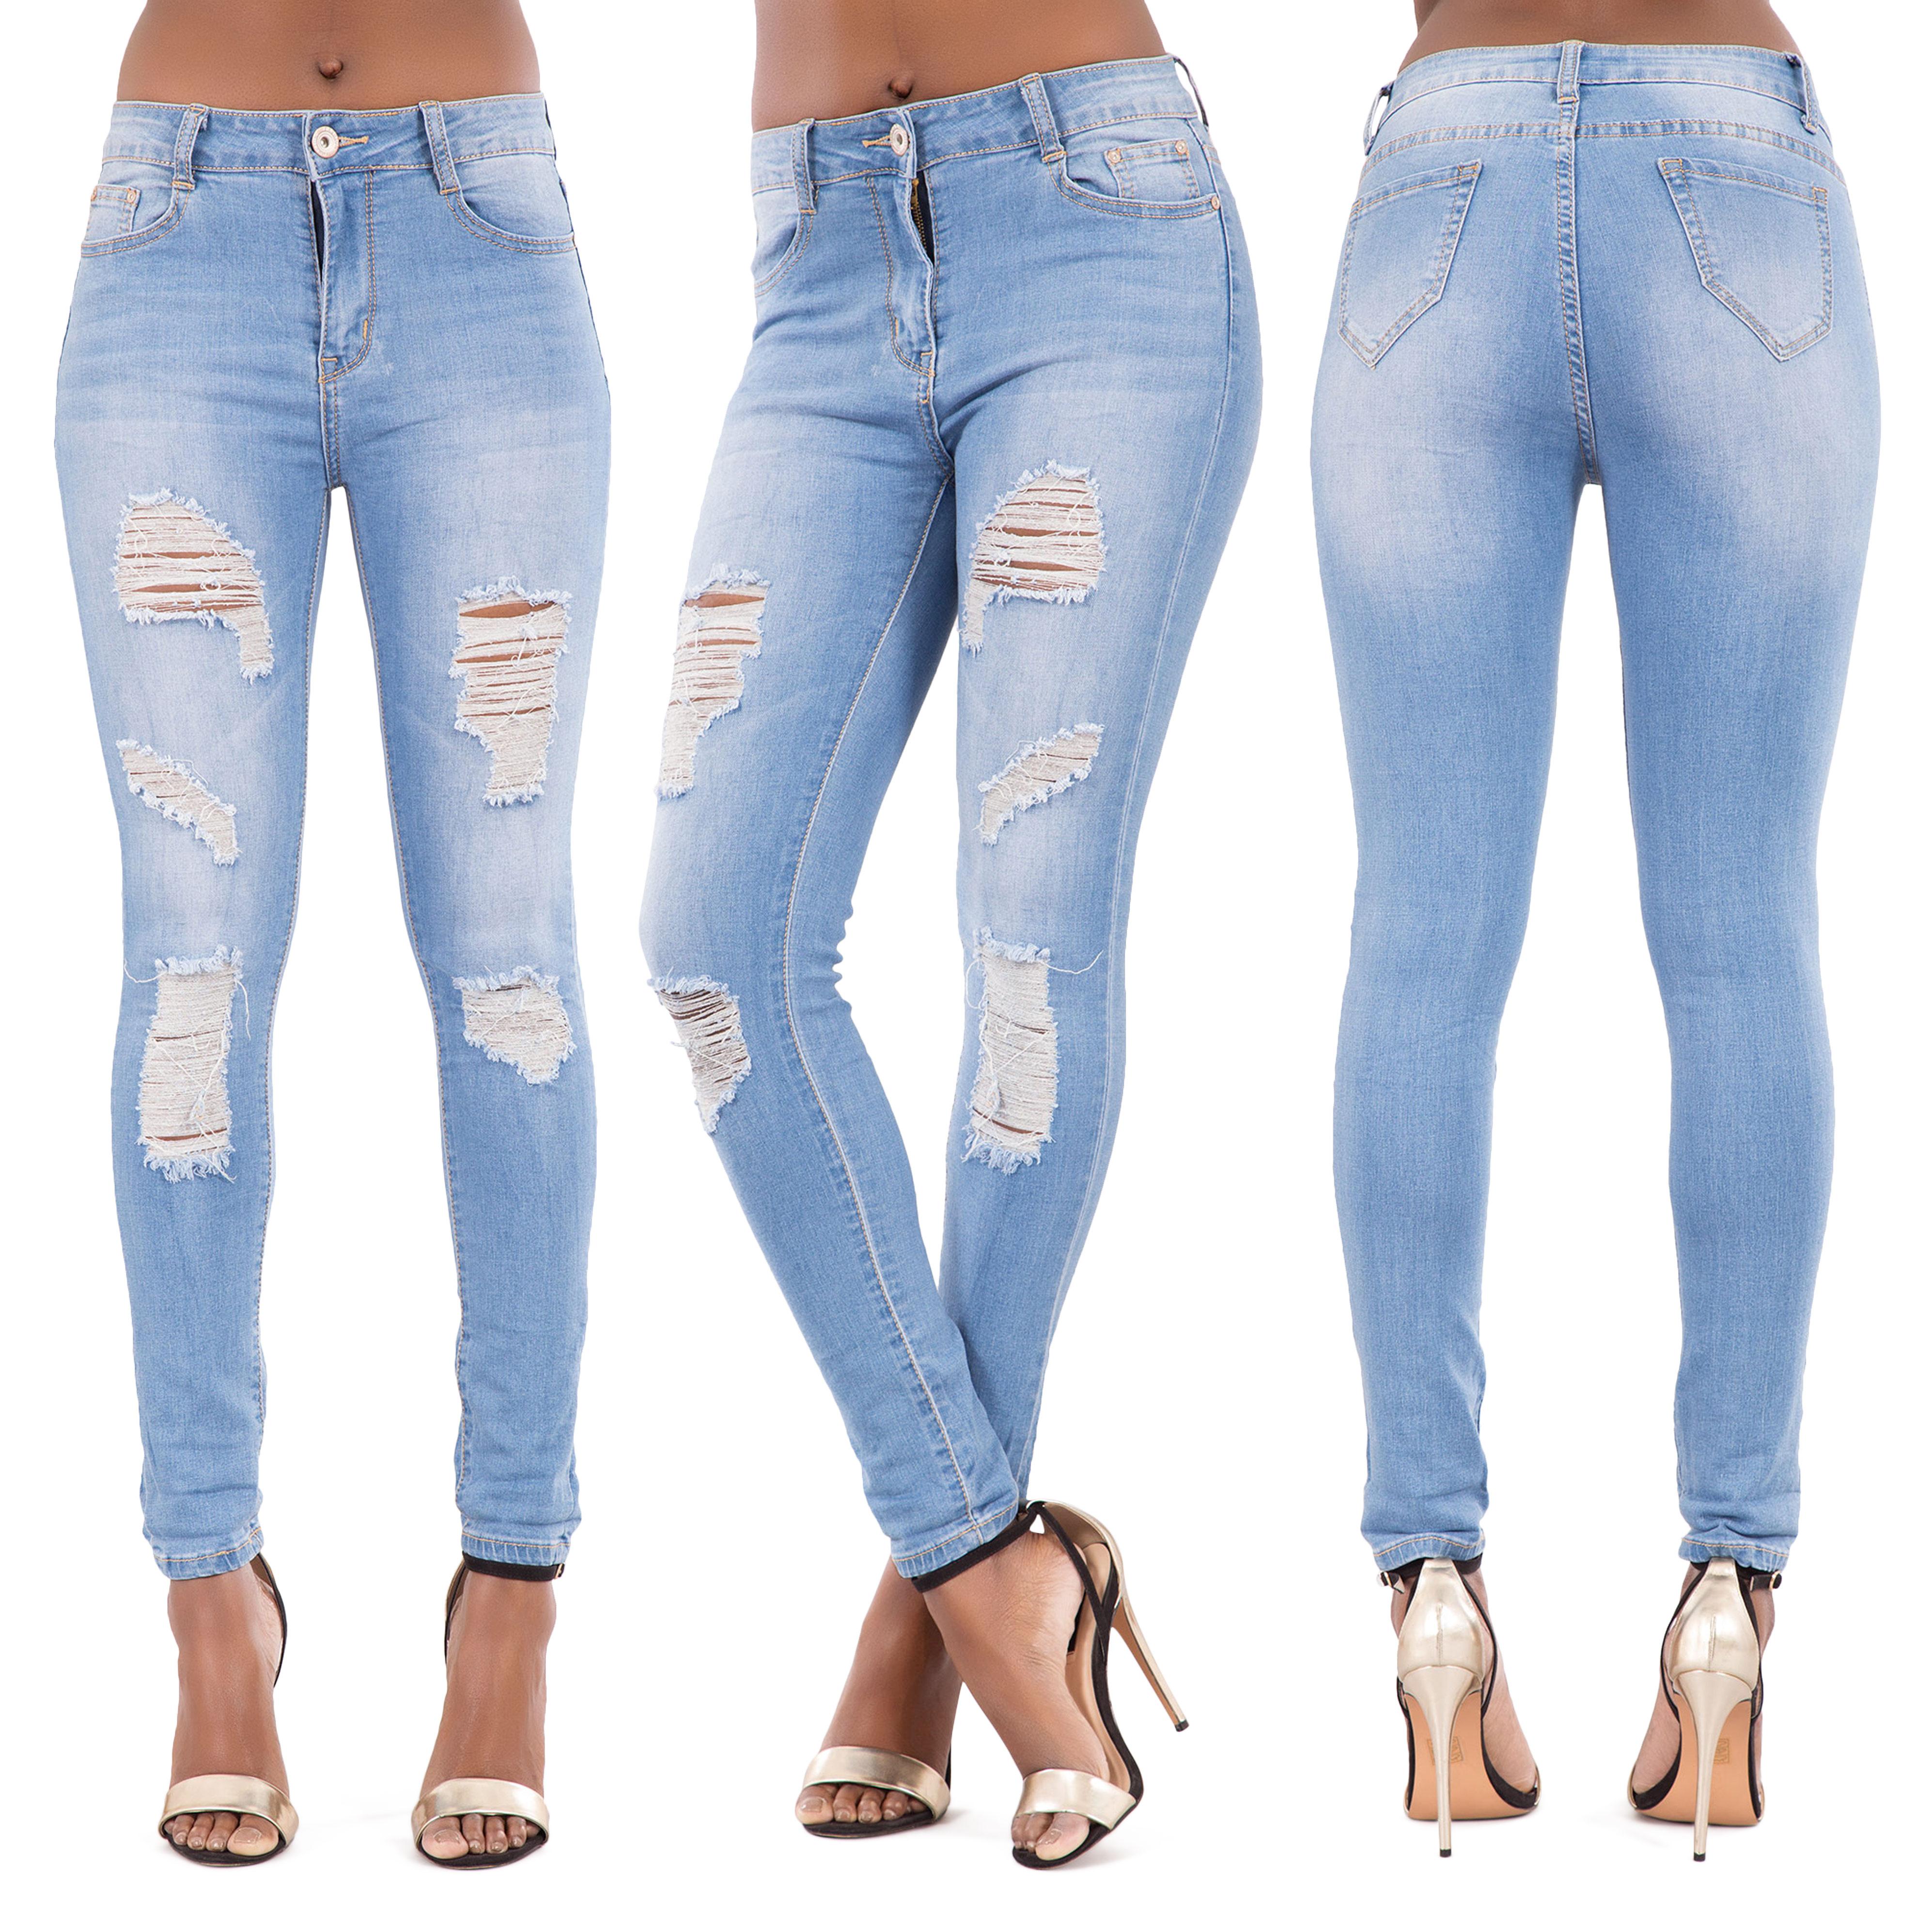 866d7e6252c Womens Blue Ripped Knee Cut Skinny Jeans Slim Fit Ladies Denim Size 6 8 10  12 14